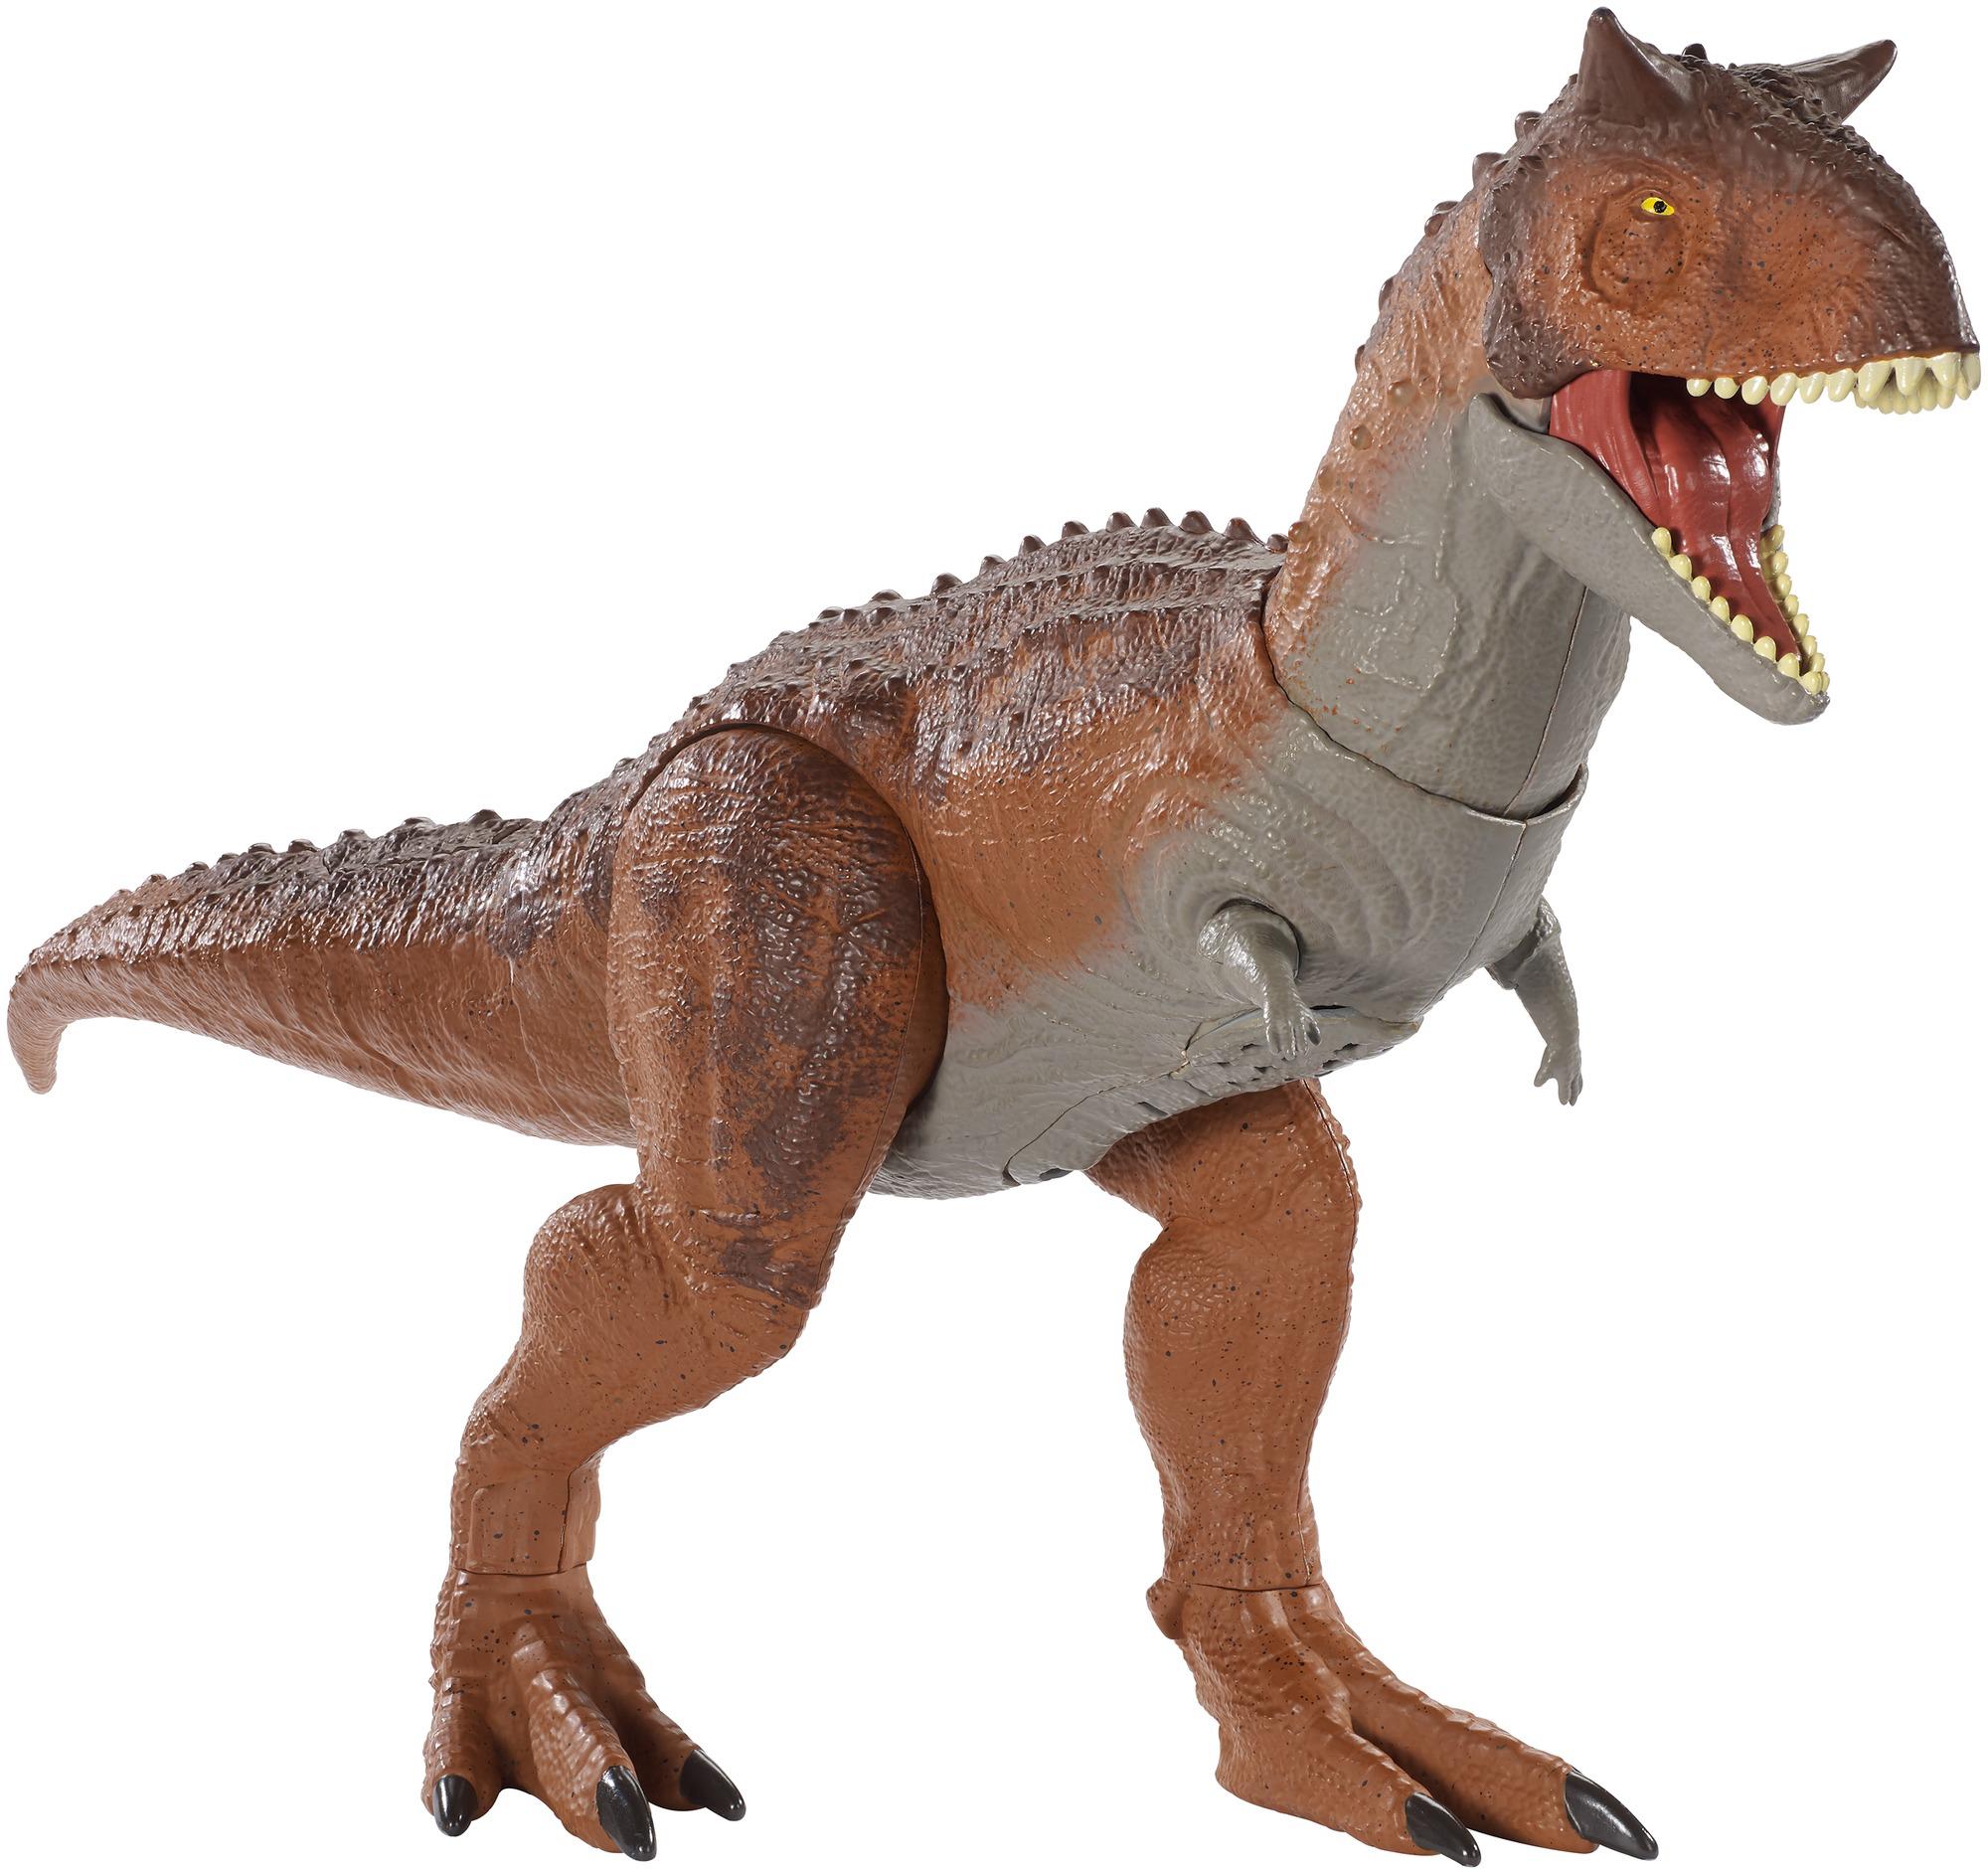 Jurassic World Control n Conquer Carnotaurus in Multicolor 2000x1885